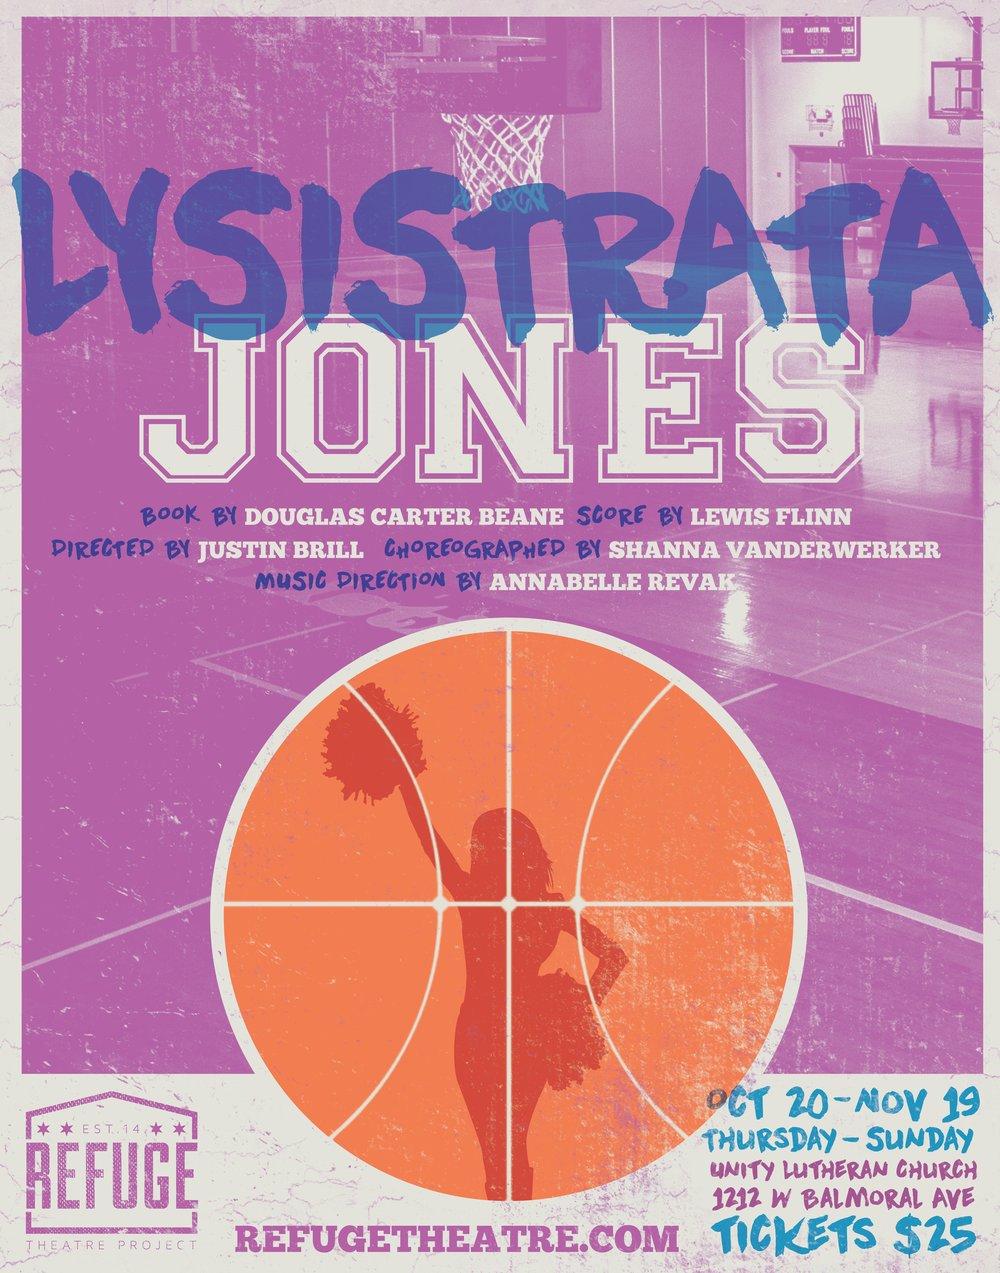 Lysistrata_Jones_Poster_FINAL small.jpg